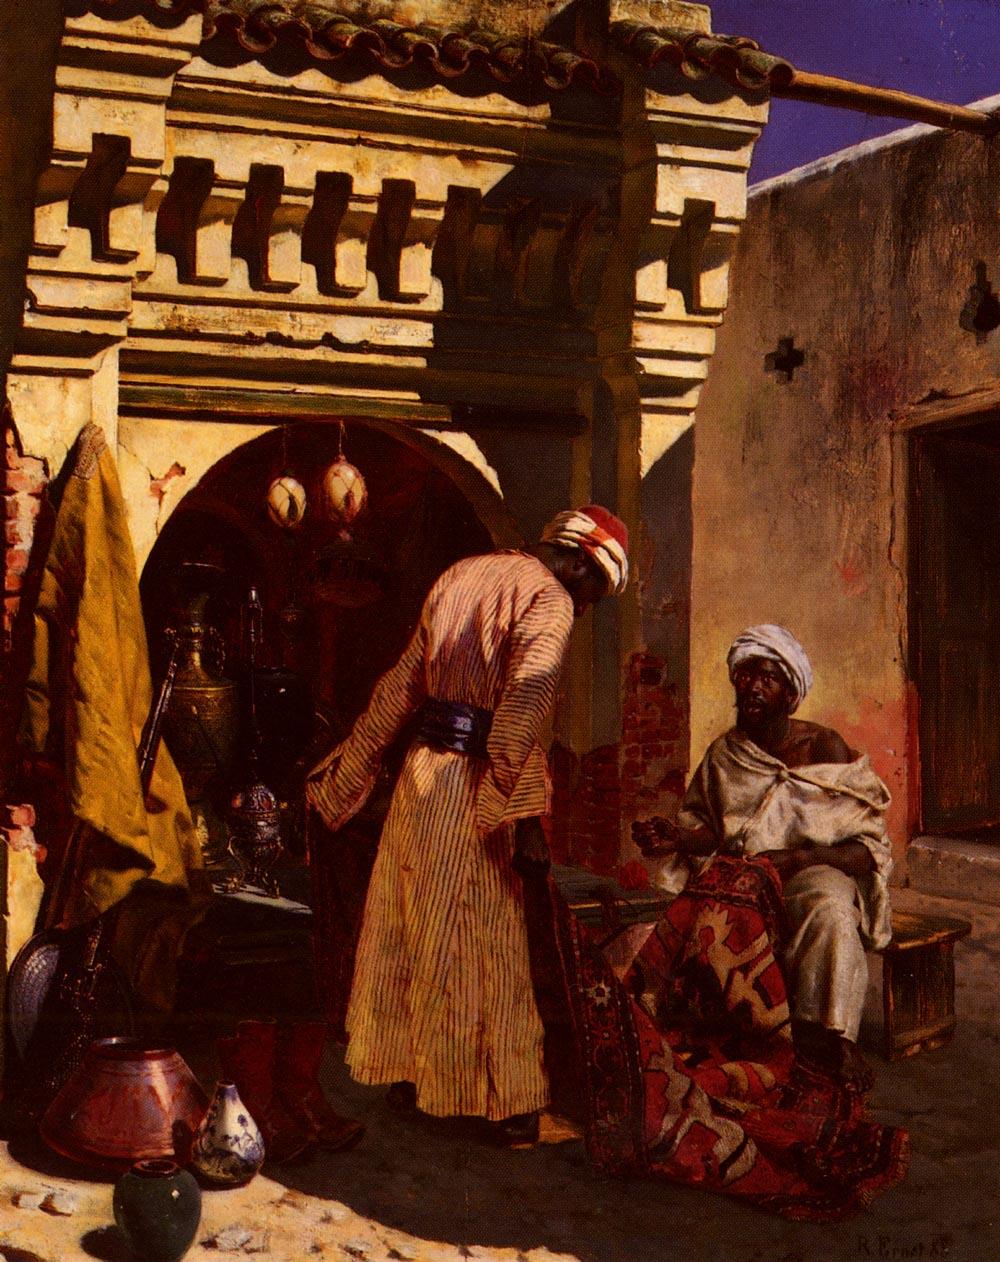 The Rug Merchant :: Rudolf Ernst - scenes of Oriental life (Orientalism) in art and painting ôîòî